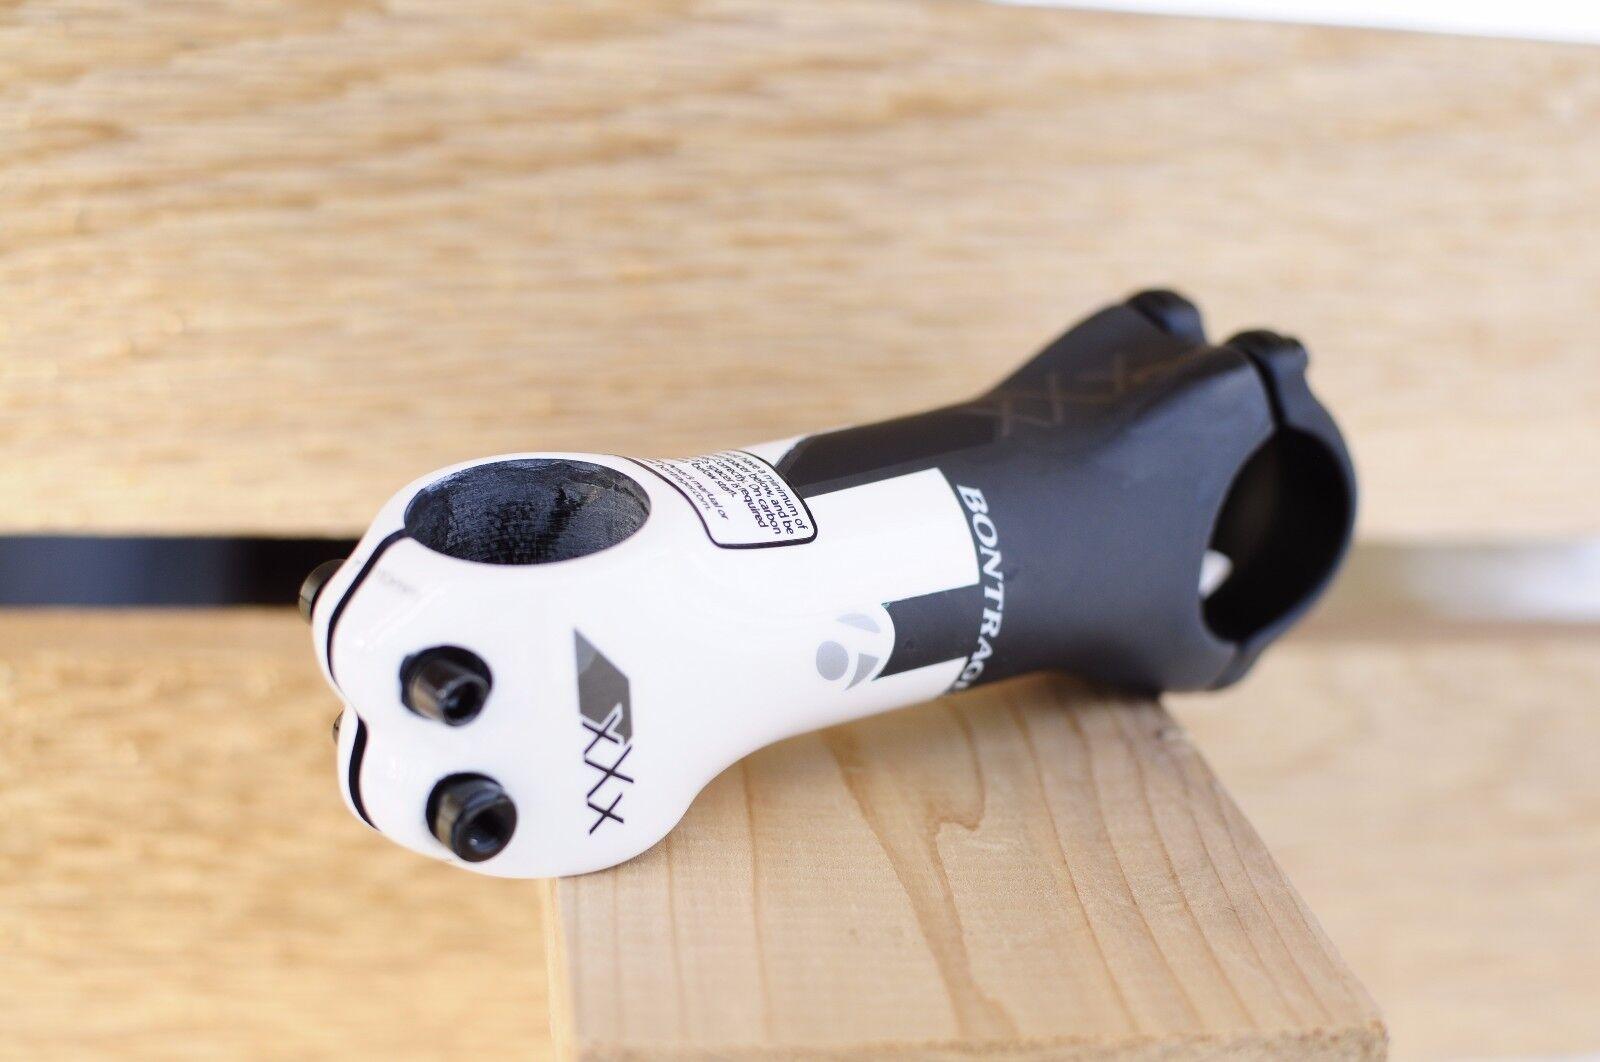 NEW Bontrager XXX Carbon Stem 110mm,  + - 7 Degree, 1 1 8 , 31.8mm